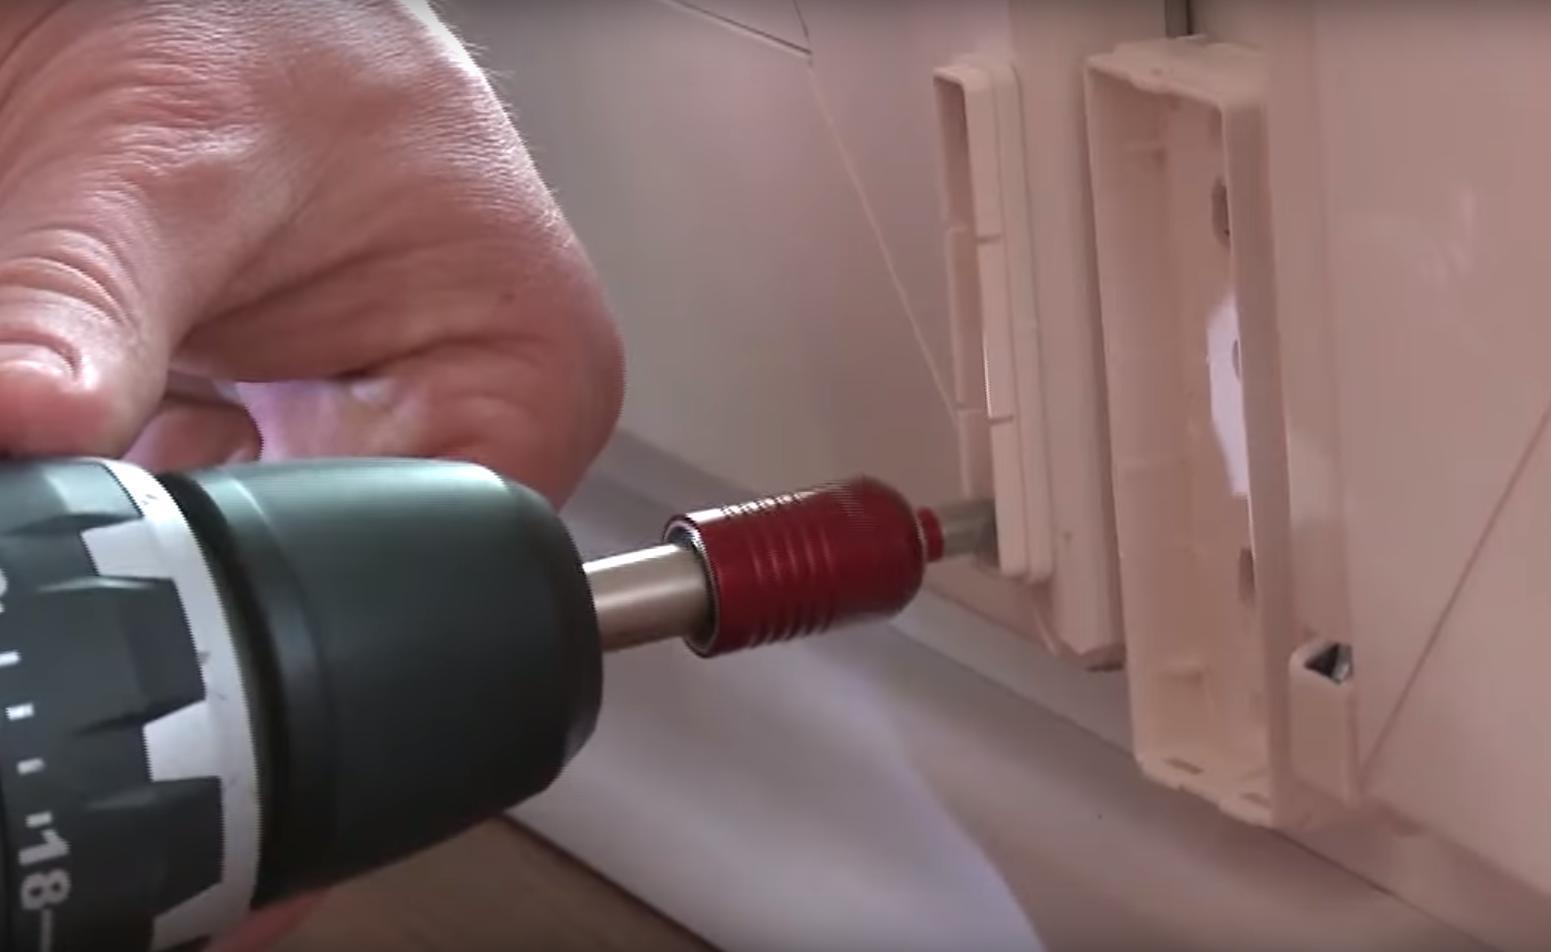 Fenstersicherheit Sensoren anbringen